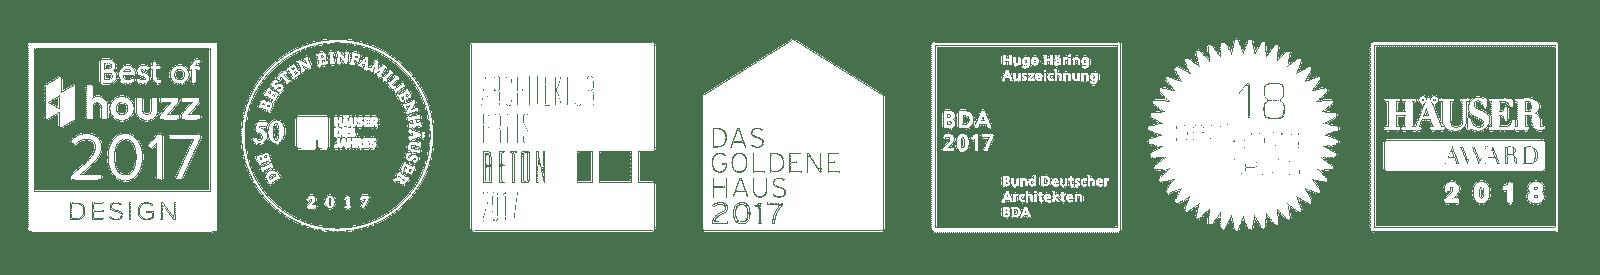 Awards Wohnhaus E20